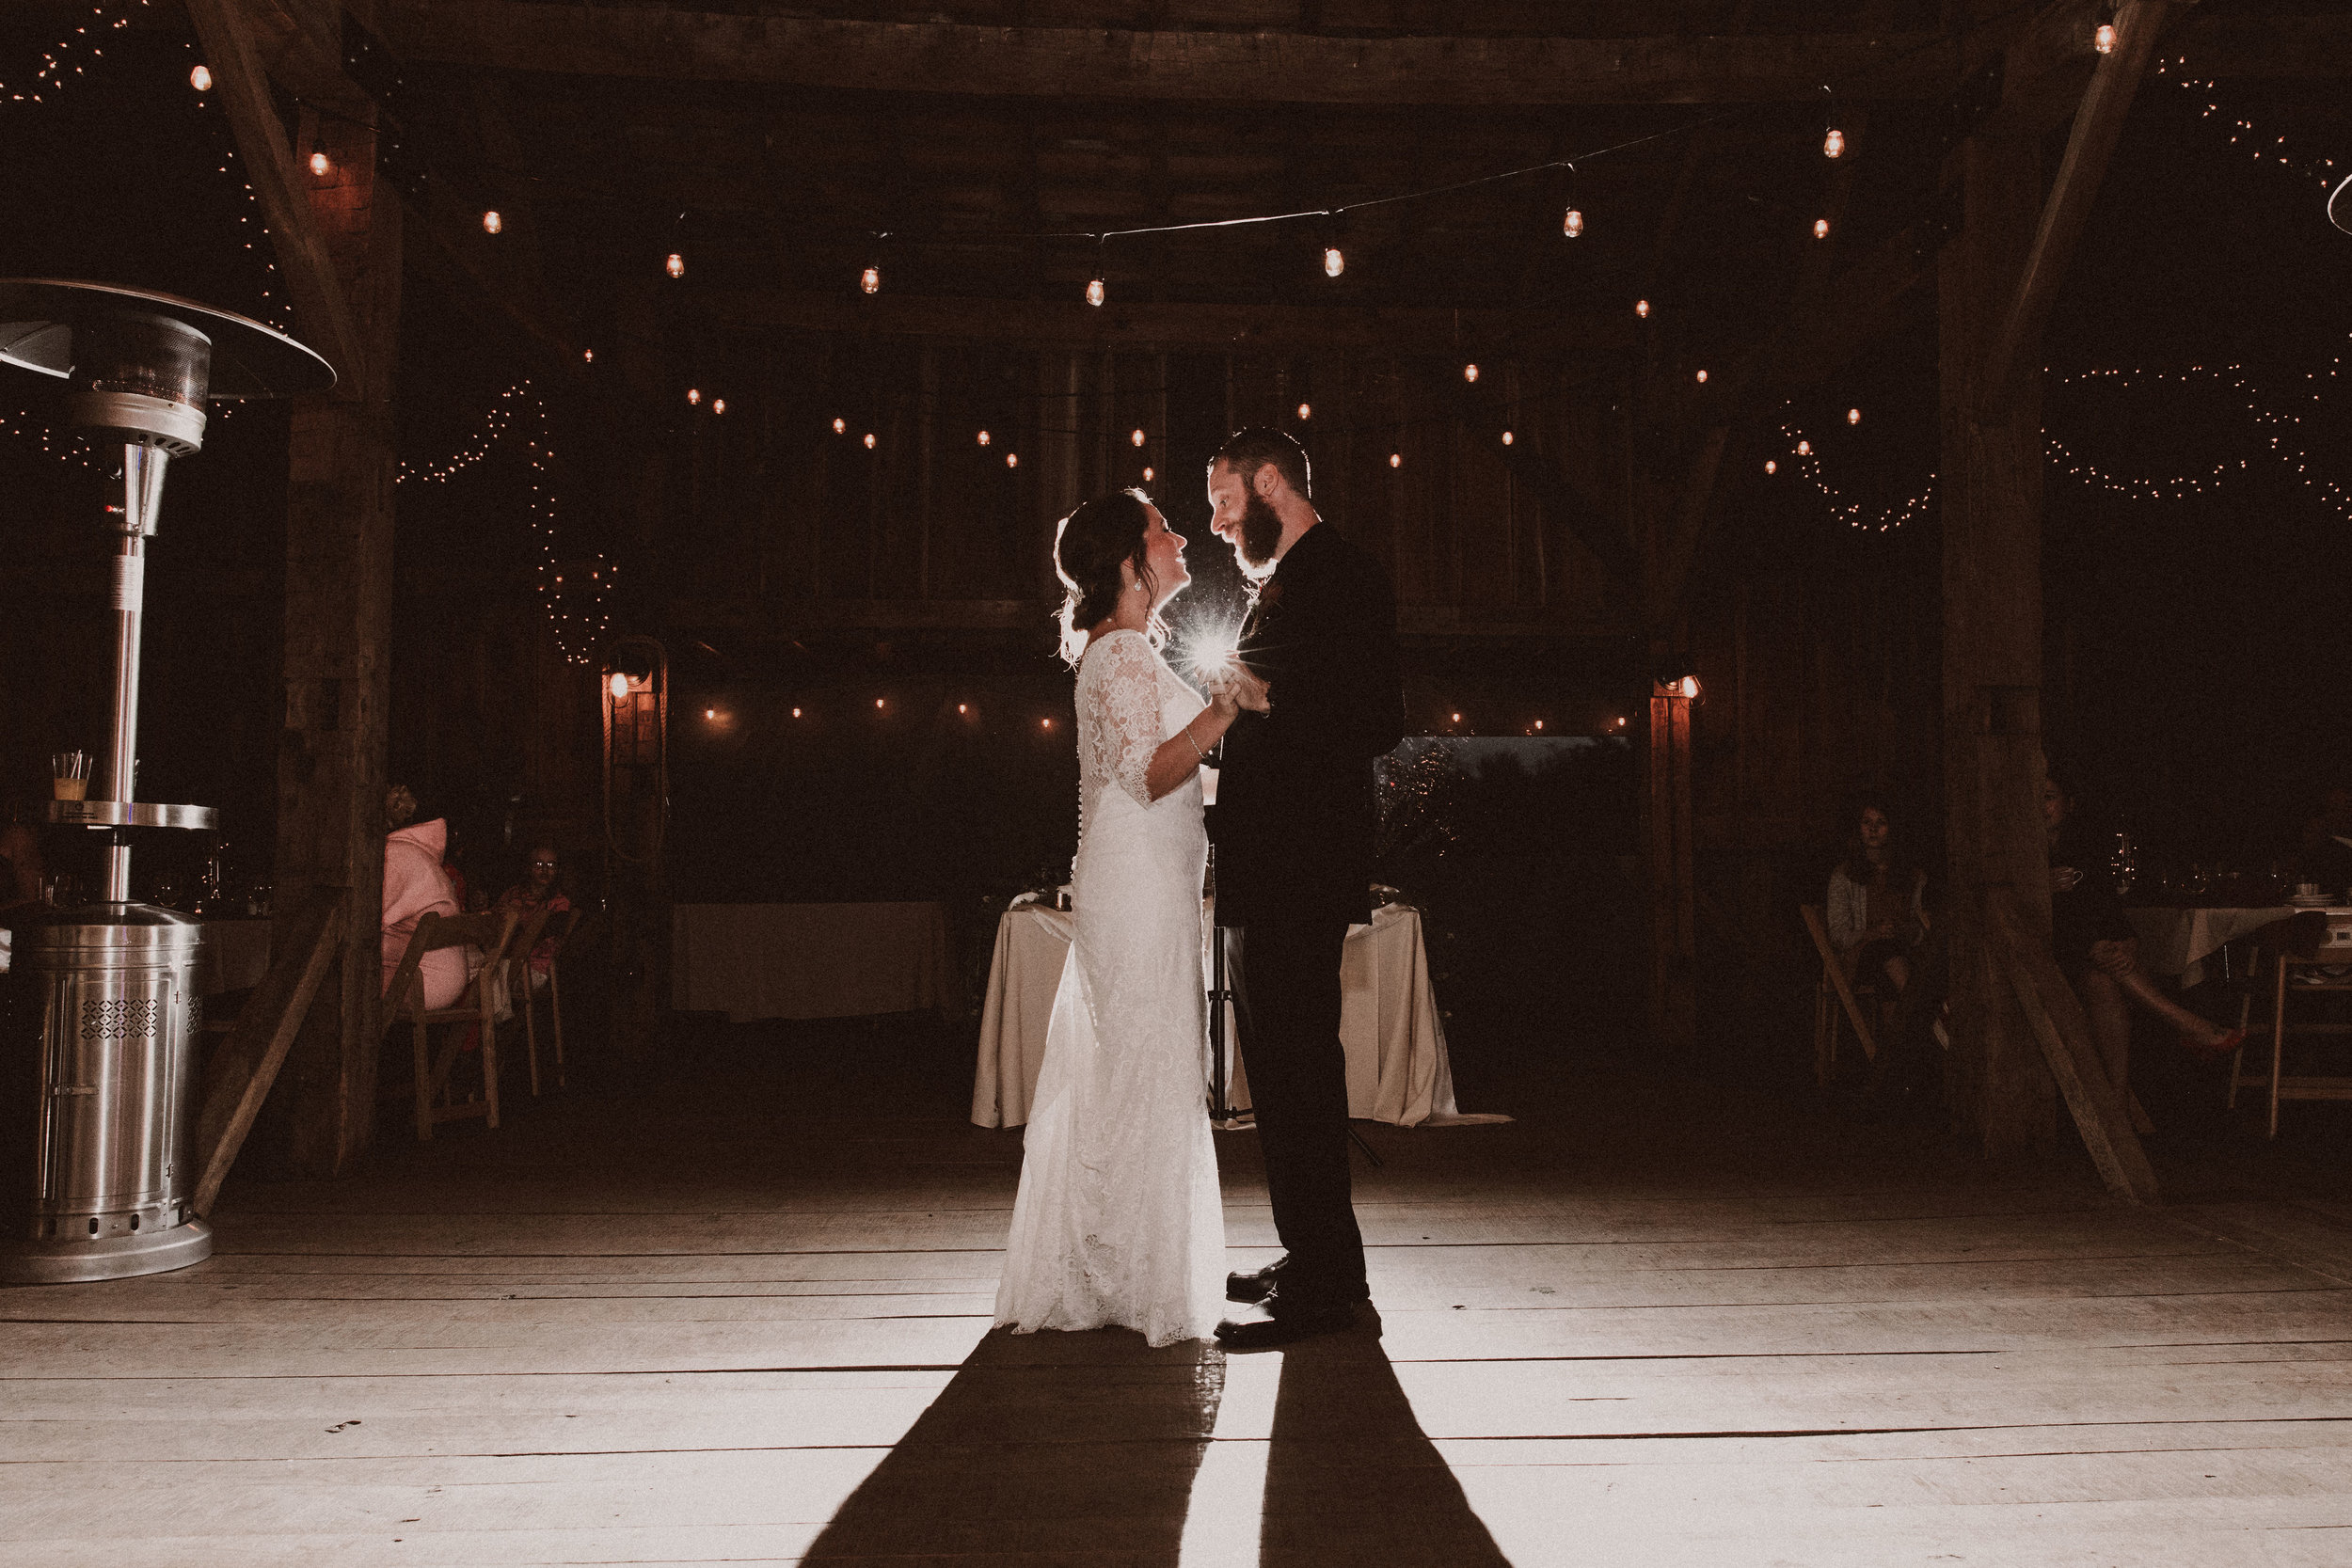 BUTLER, PA WEDDING PHOTOGRAPHER - 5W7A7456.jpg